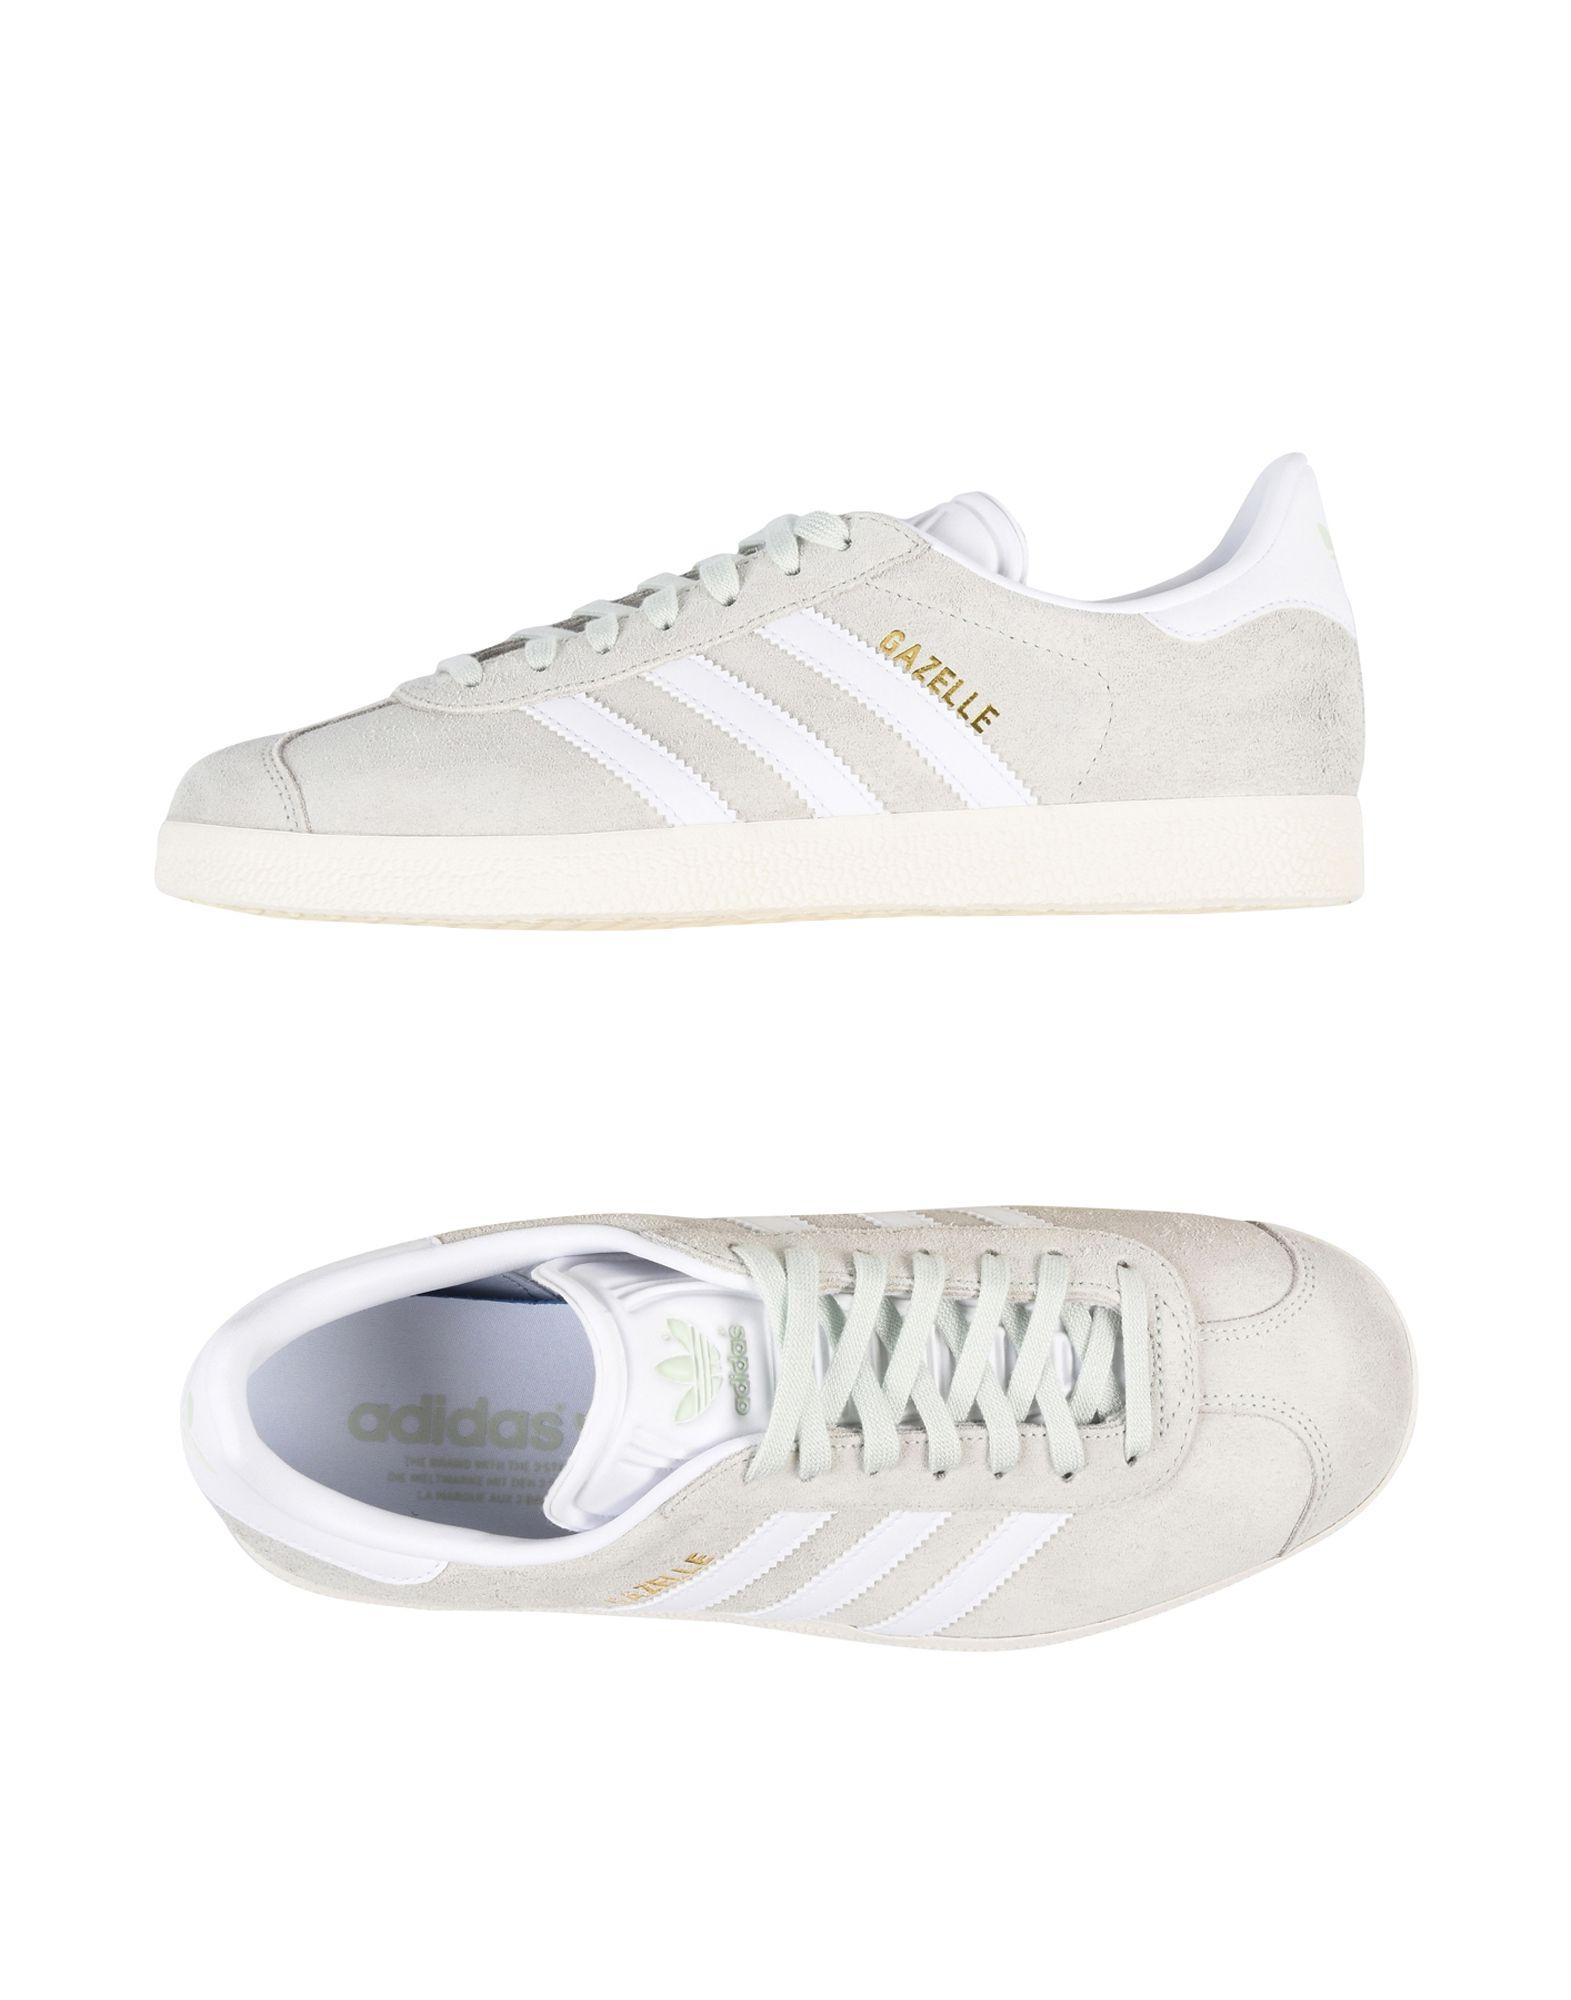 wholesale dealer 0f5b4 570d8 ΤΕΝΝΙΣ. Adidas Originals